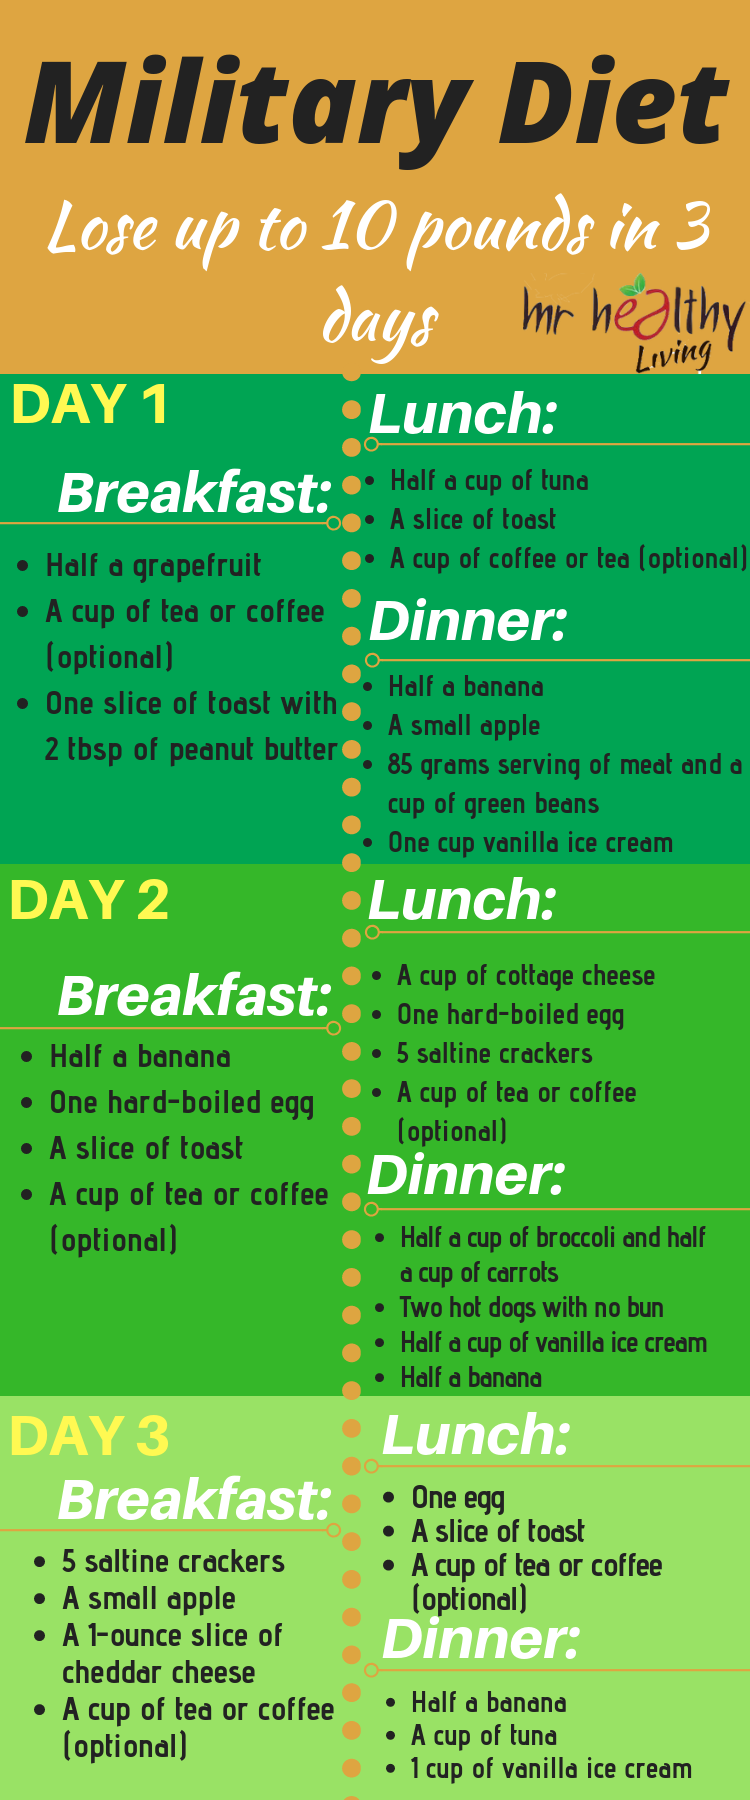 Fertile diet plan to get ripped #dieta #WeightLossProgramsForWomen